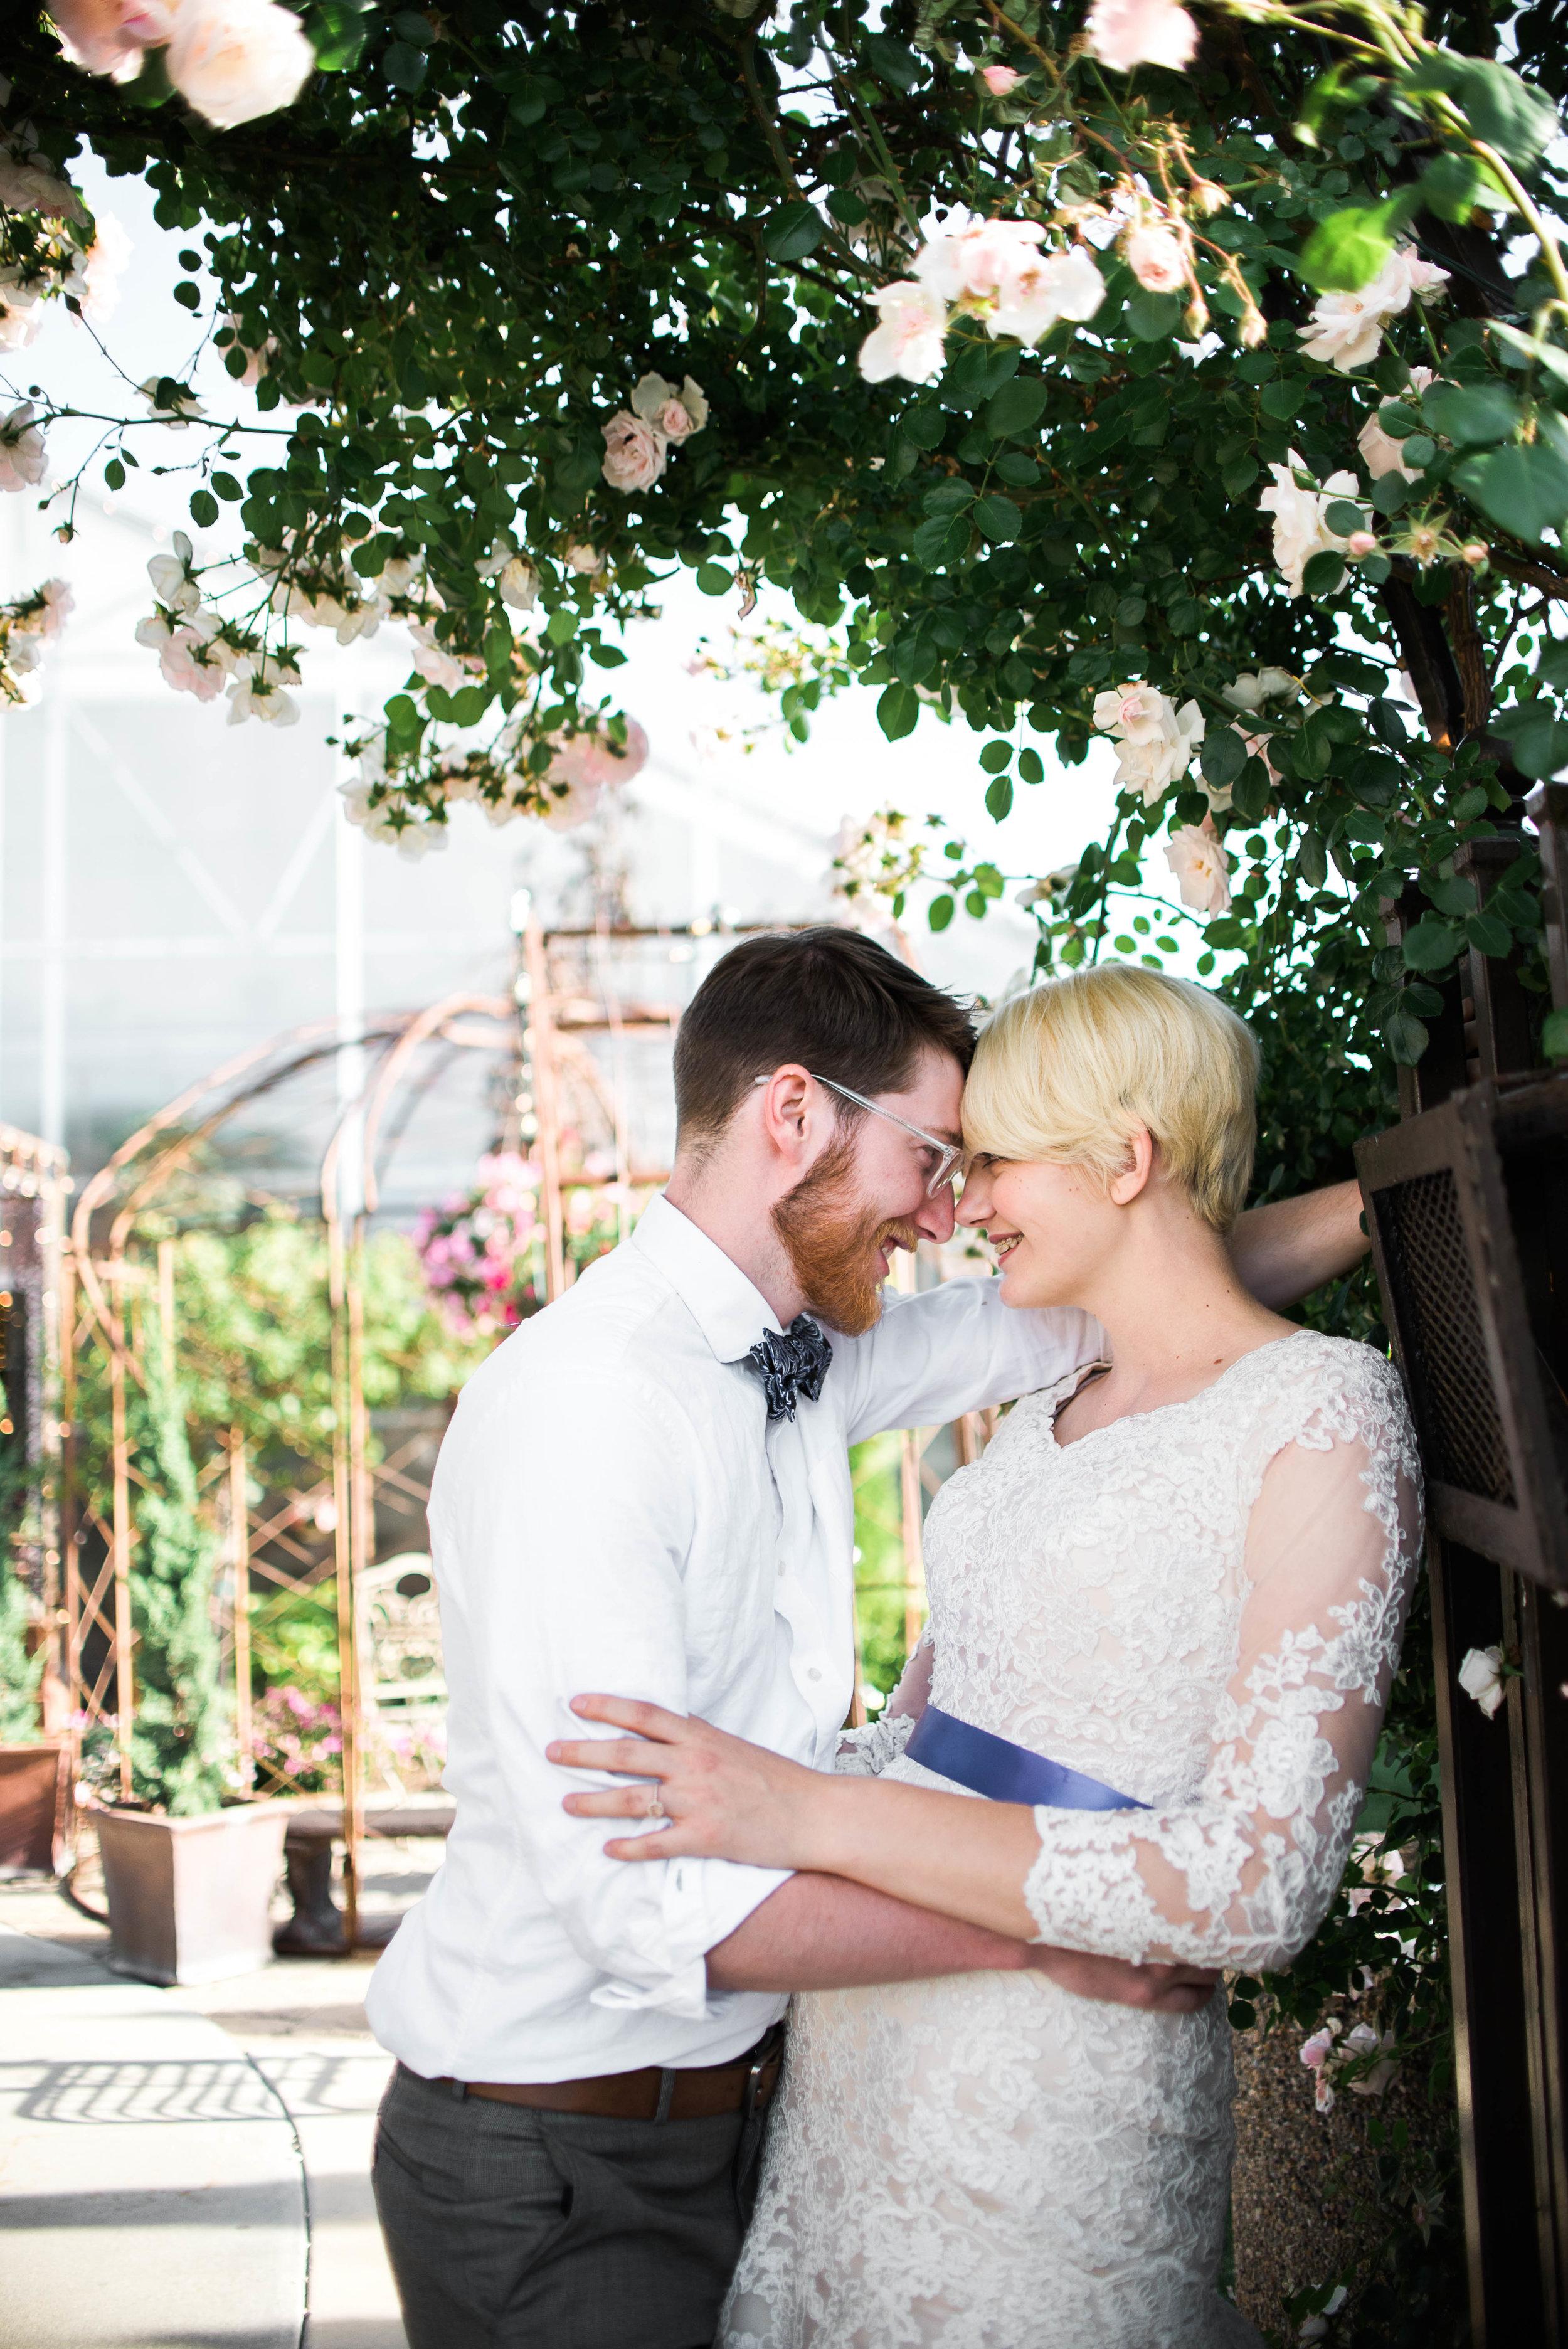 K+M-Wedding-DaySadie_Banks_Photography-914.jpg